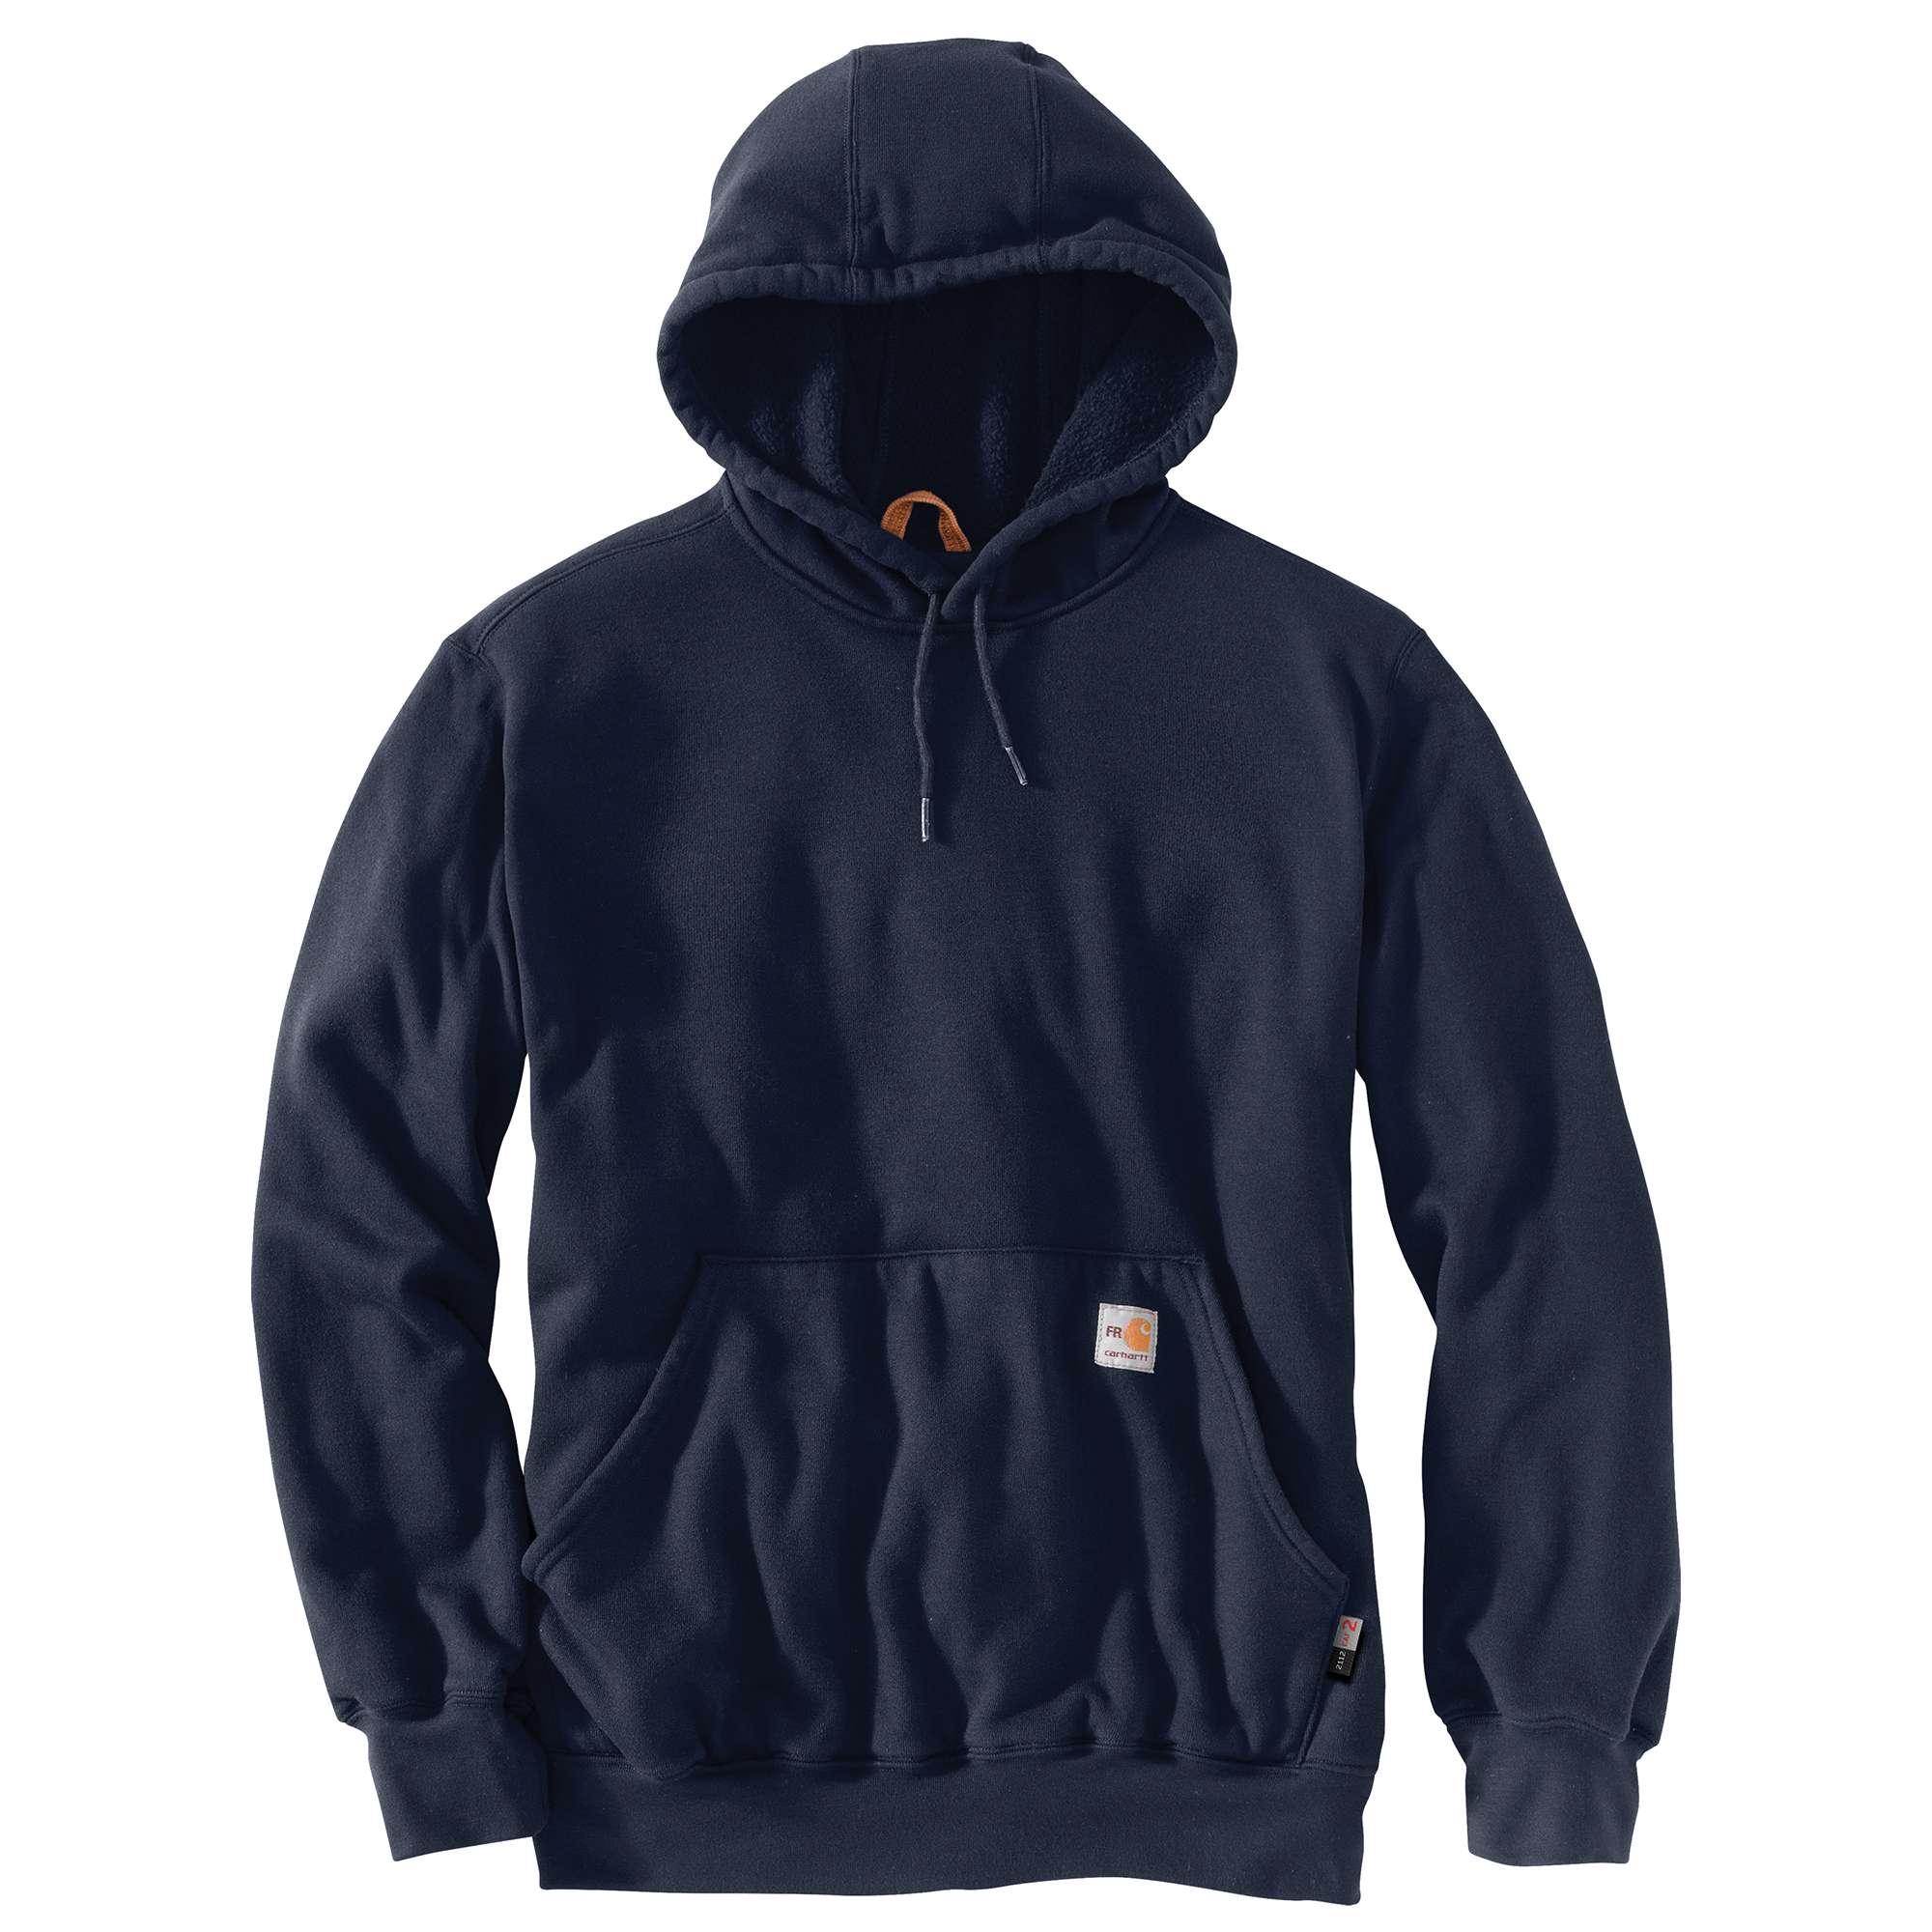 Carhartt FR Heavy Weight Hooded Sweatshirt-Carhartt